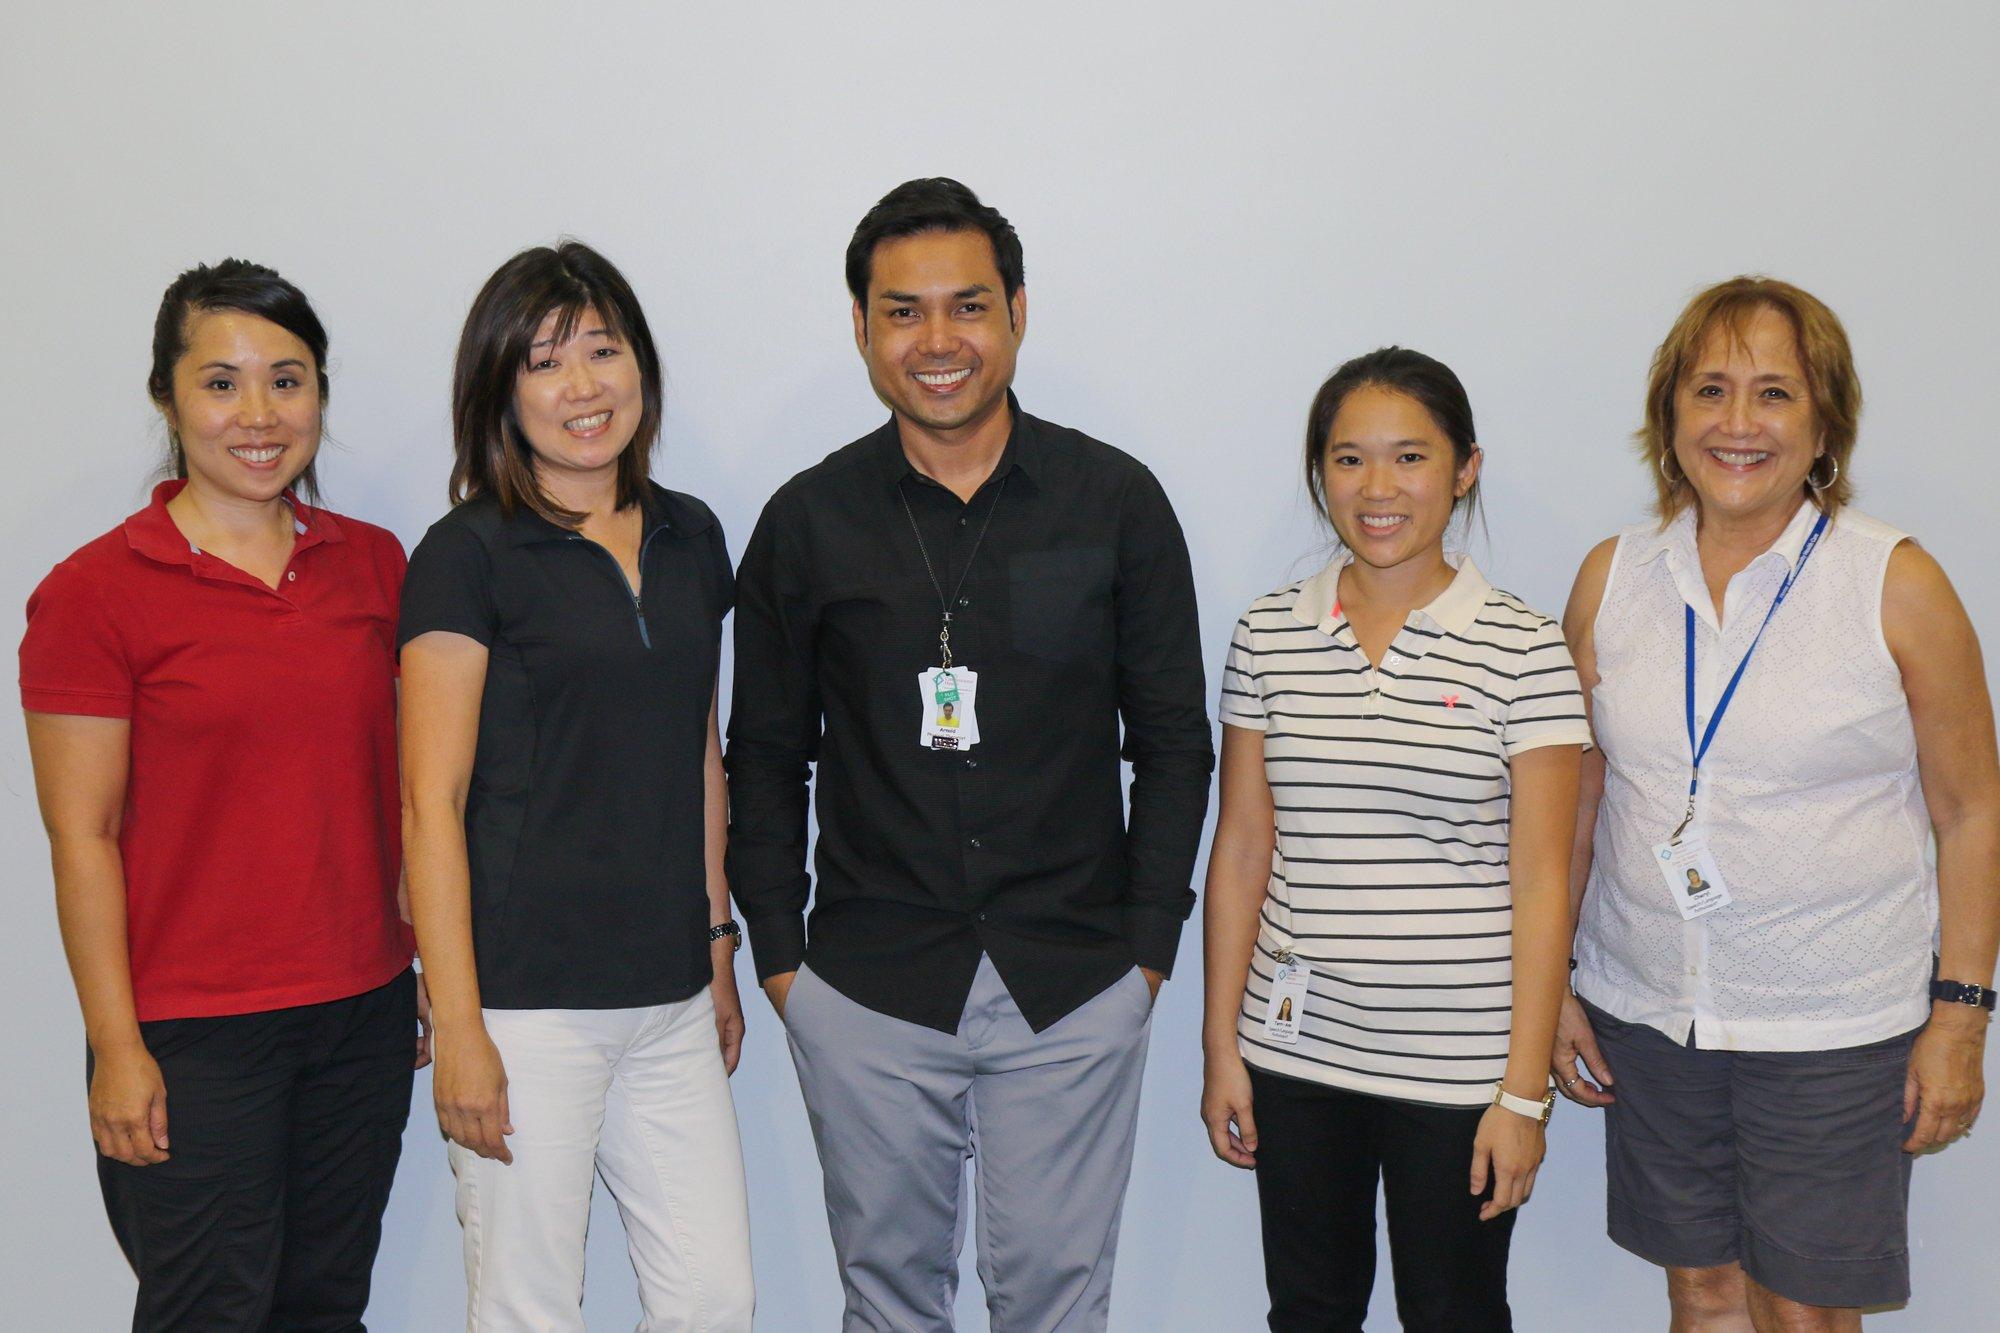 Speech Therapist team at CareResource Hawaii